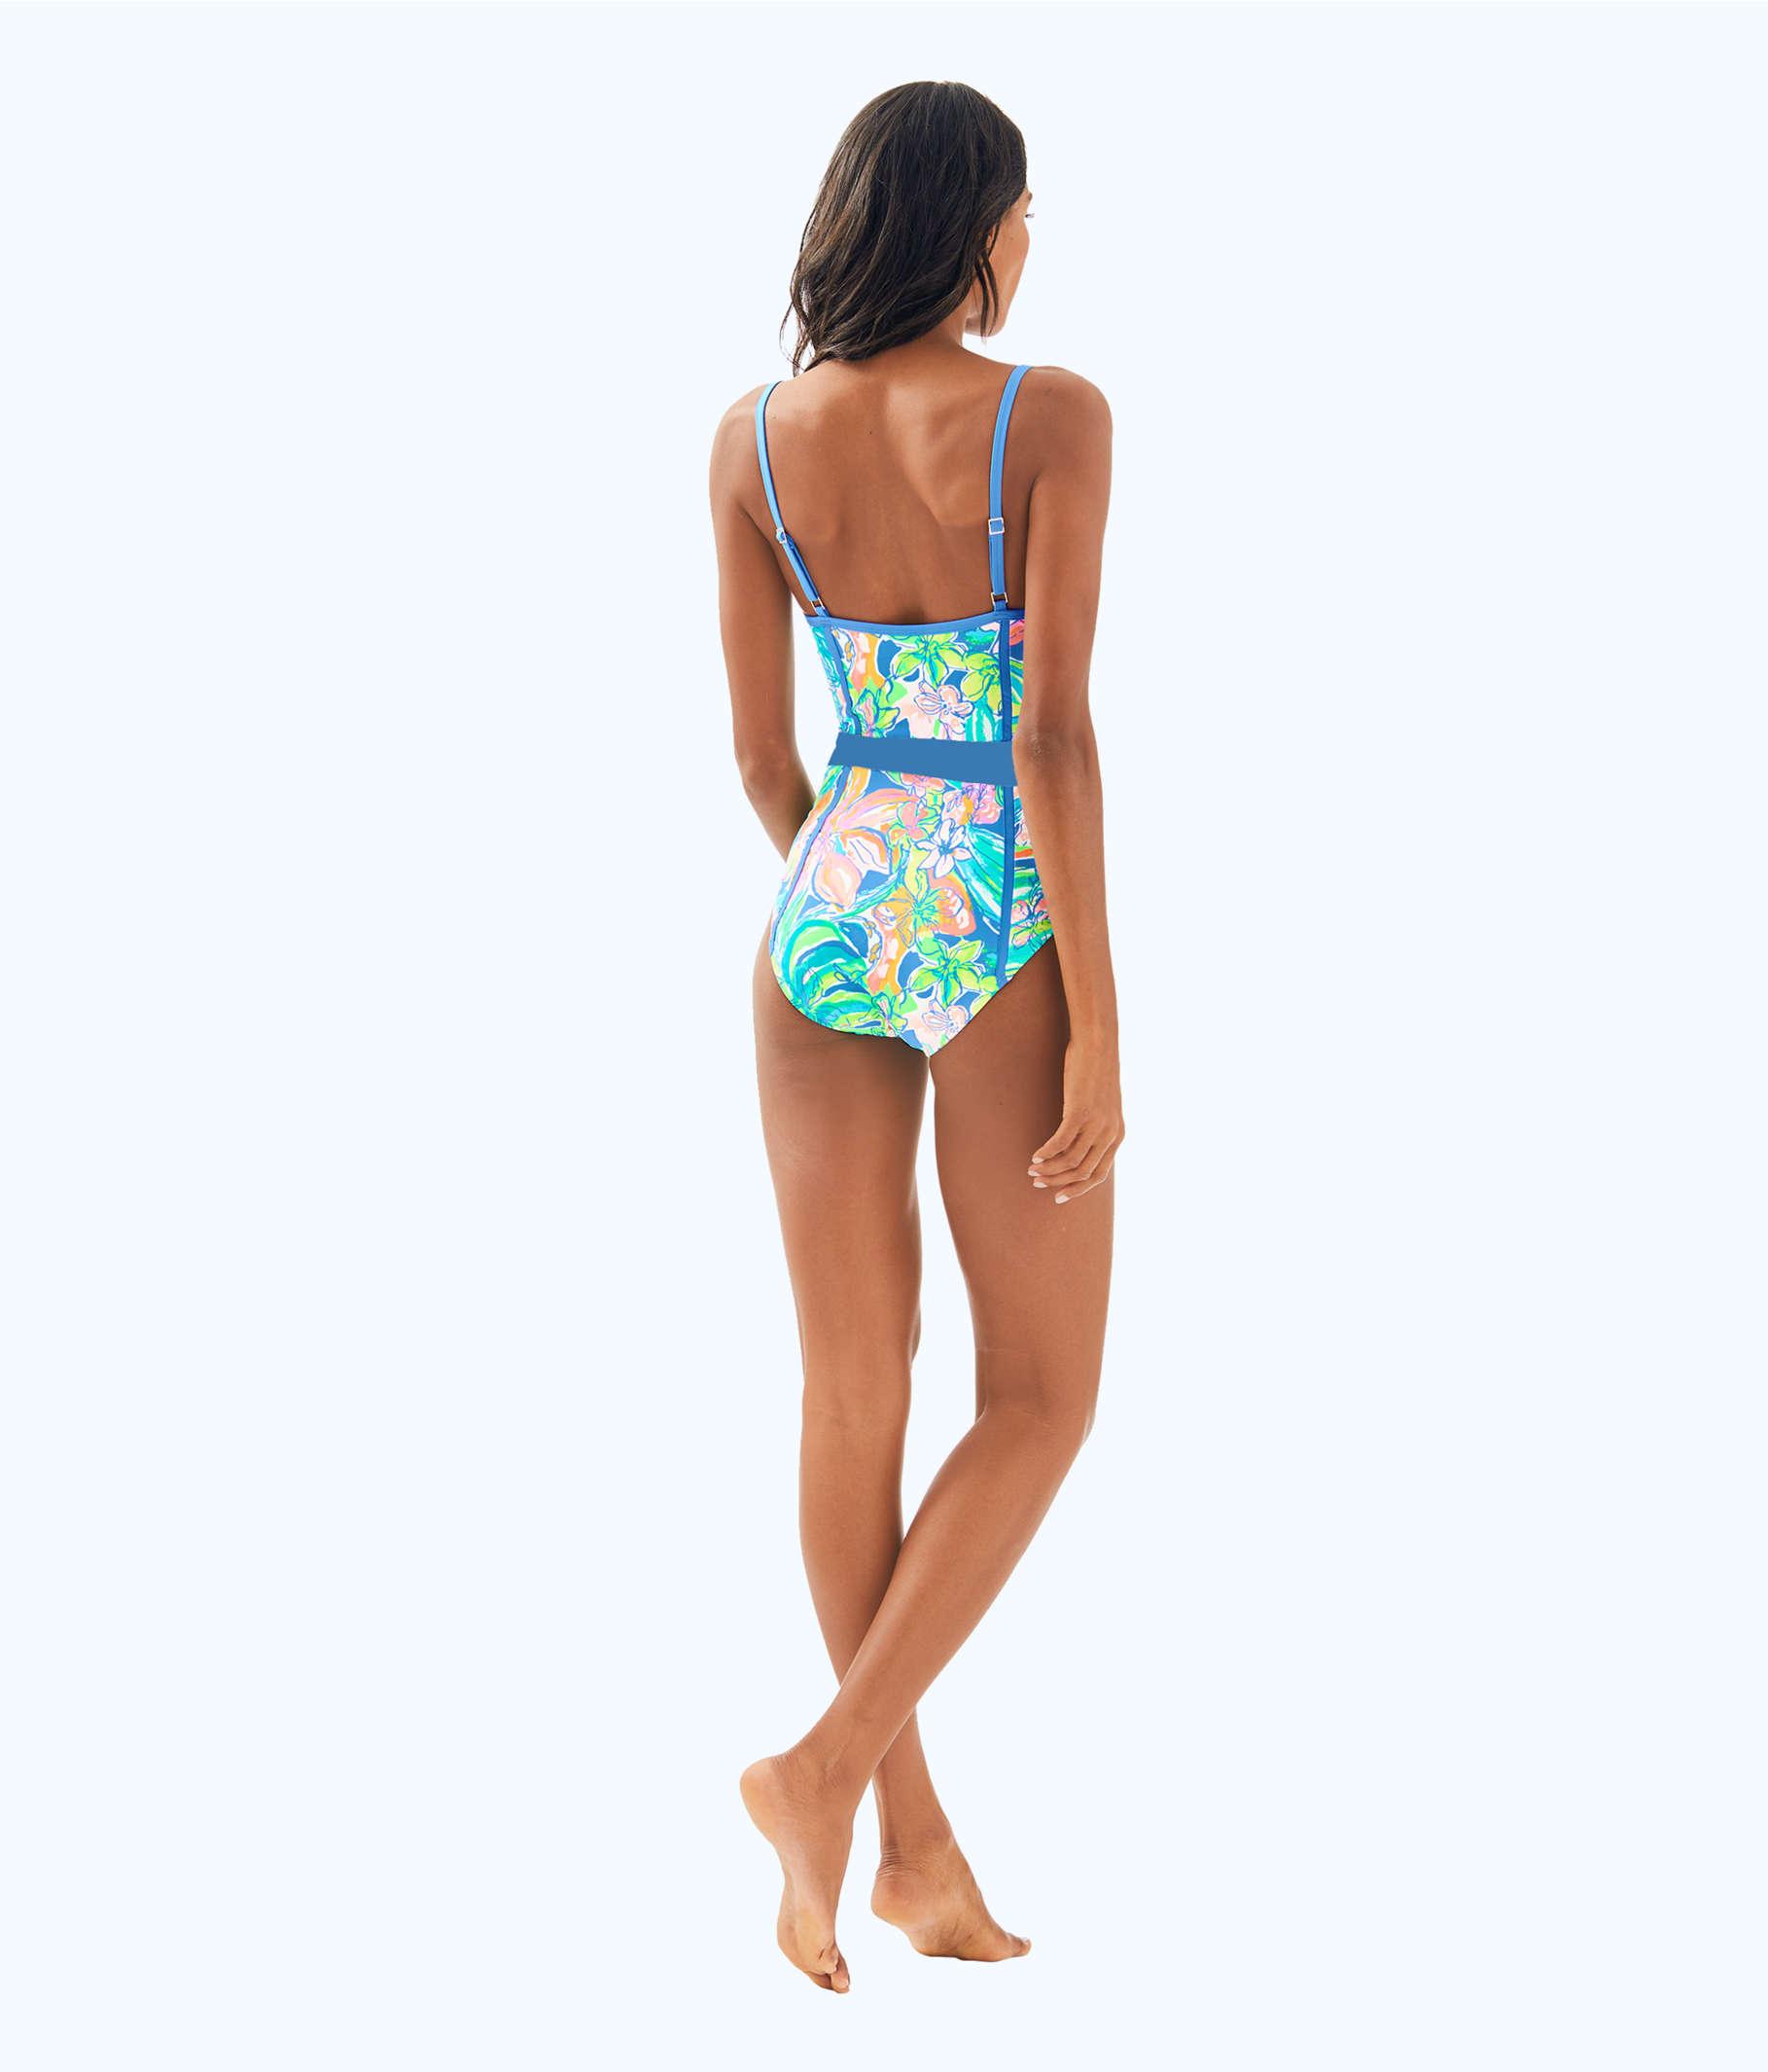 17922afa46 ... Palma One Piece Swimsuit, Bennet Blue Surf Gypsea Swim, large ...